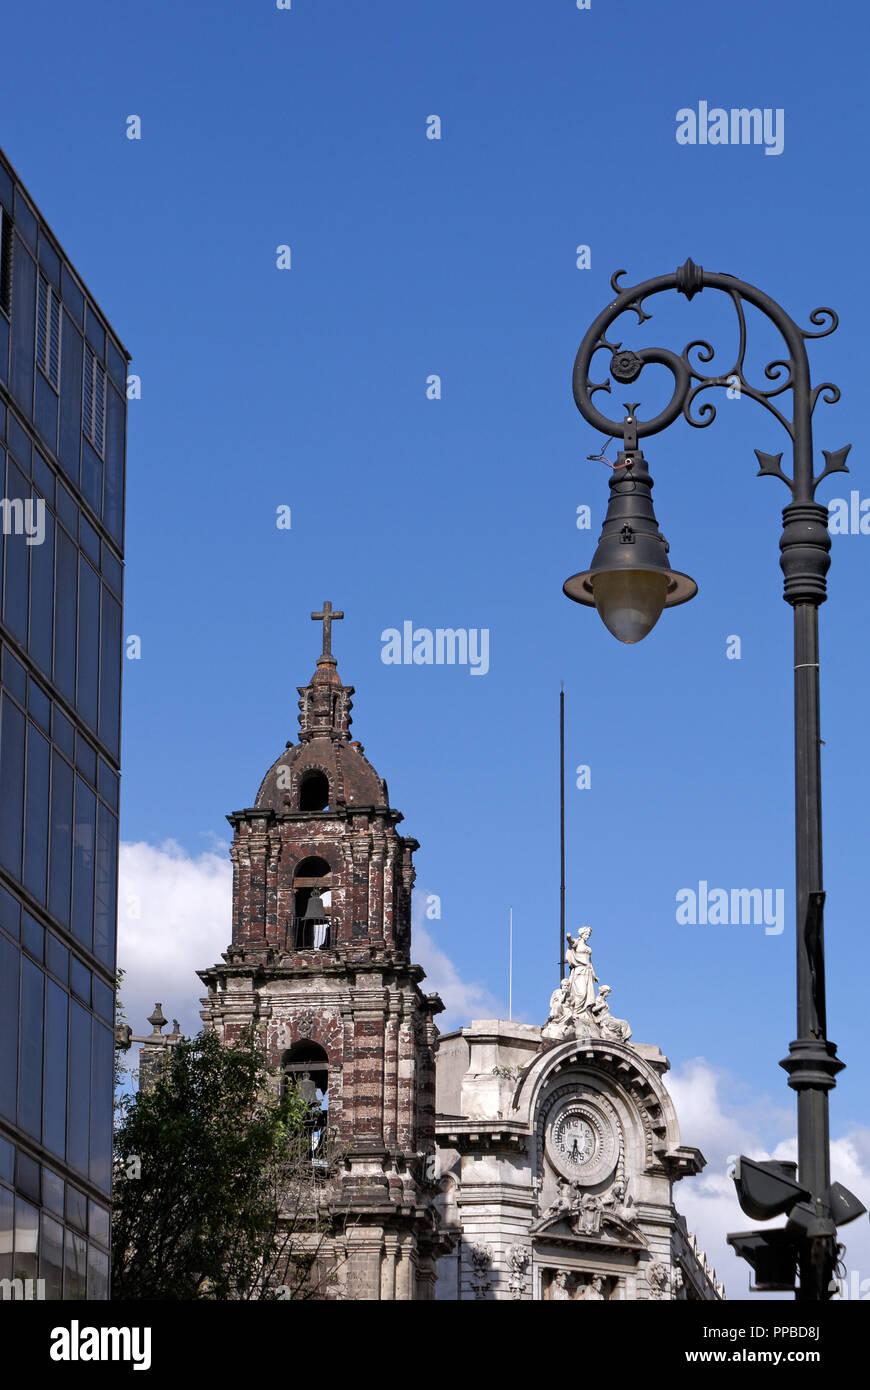 Contrasting Spanish colonial architecture, 19th century architecture, and modern architecture in the Centro Historico, Mexico City - Stock Image